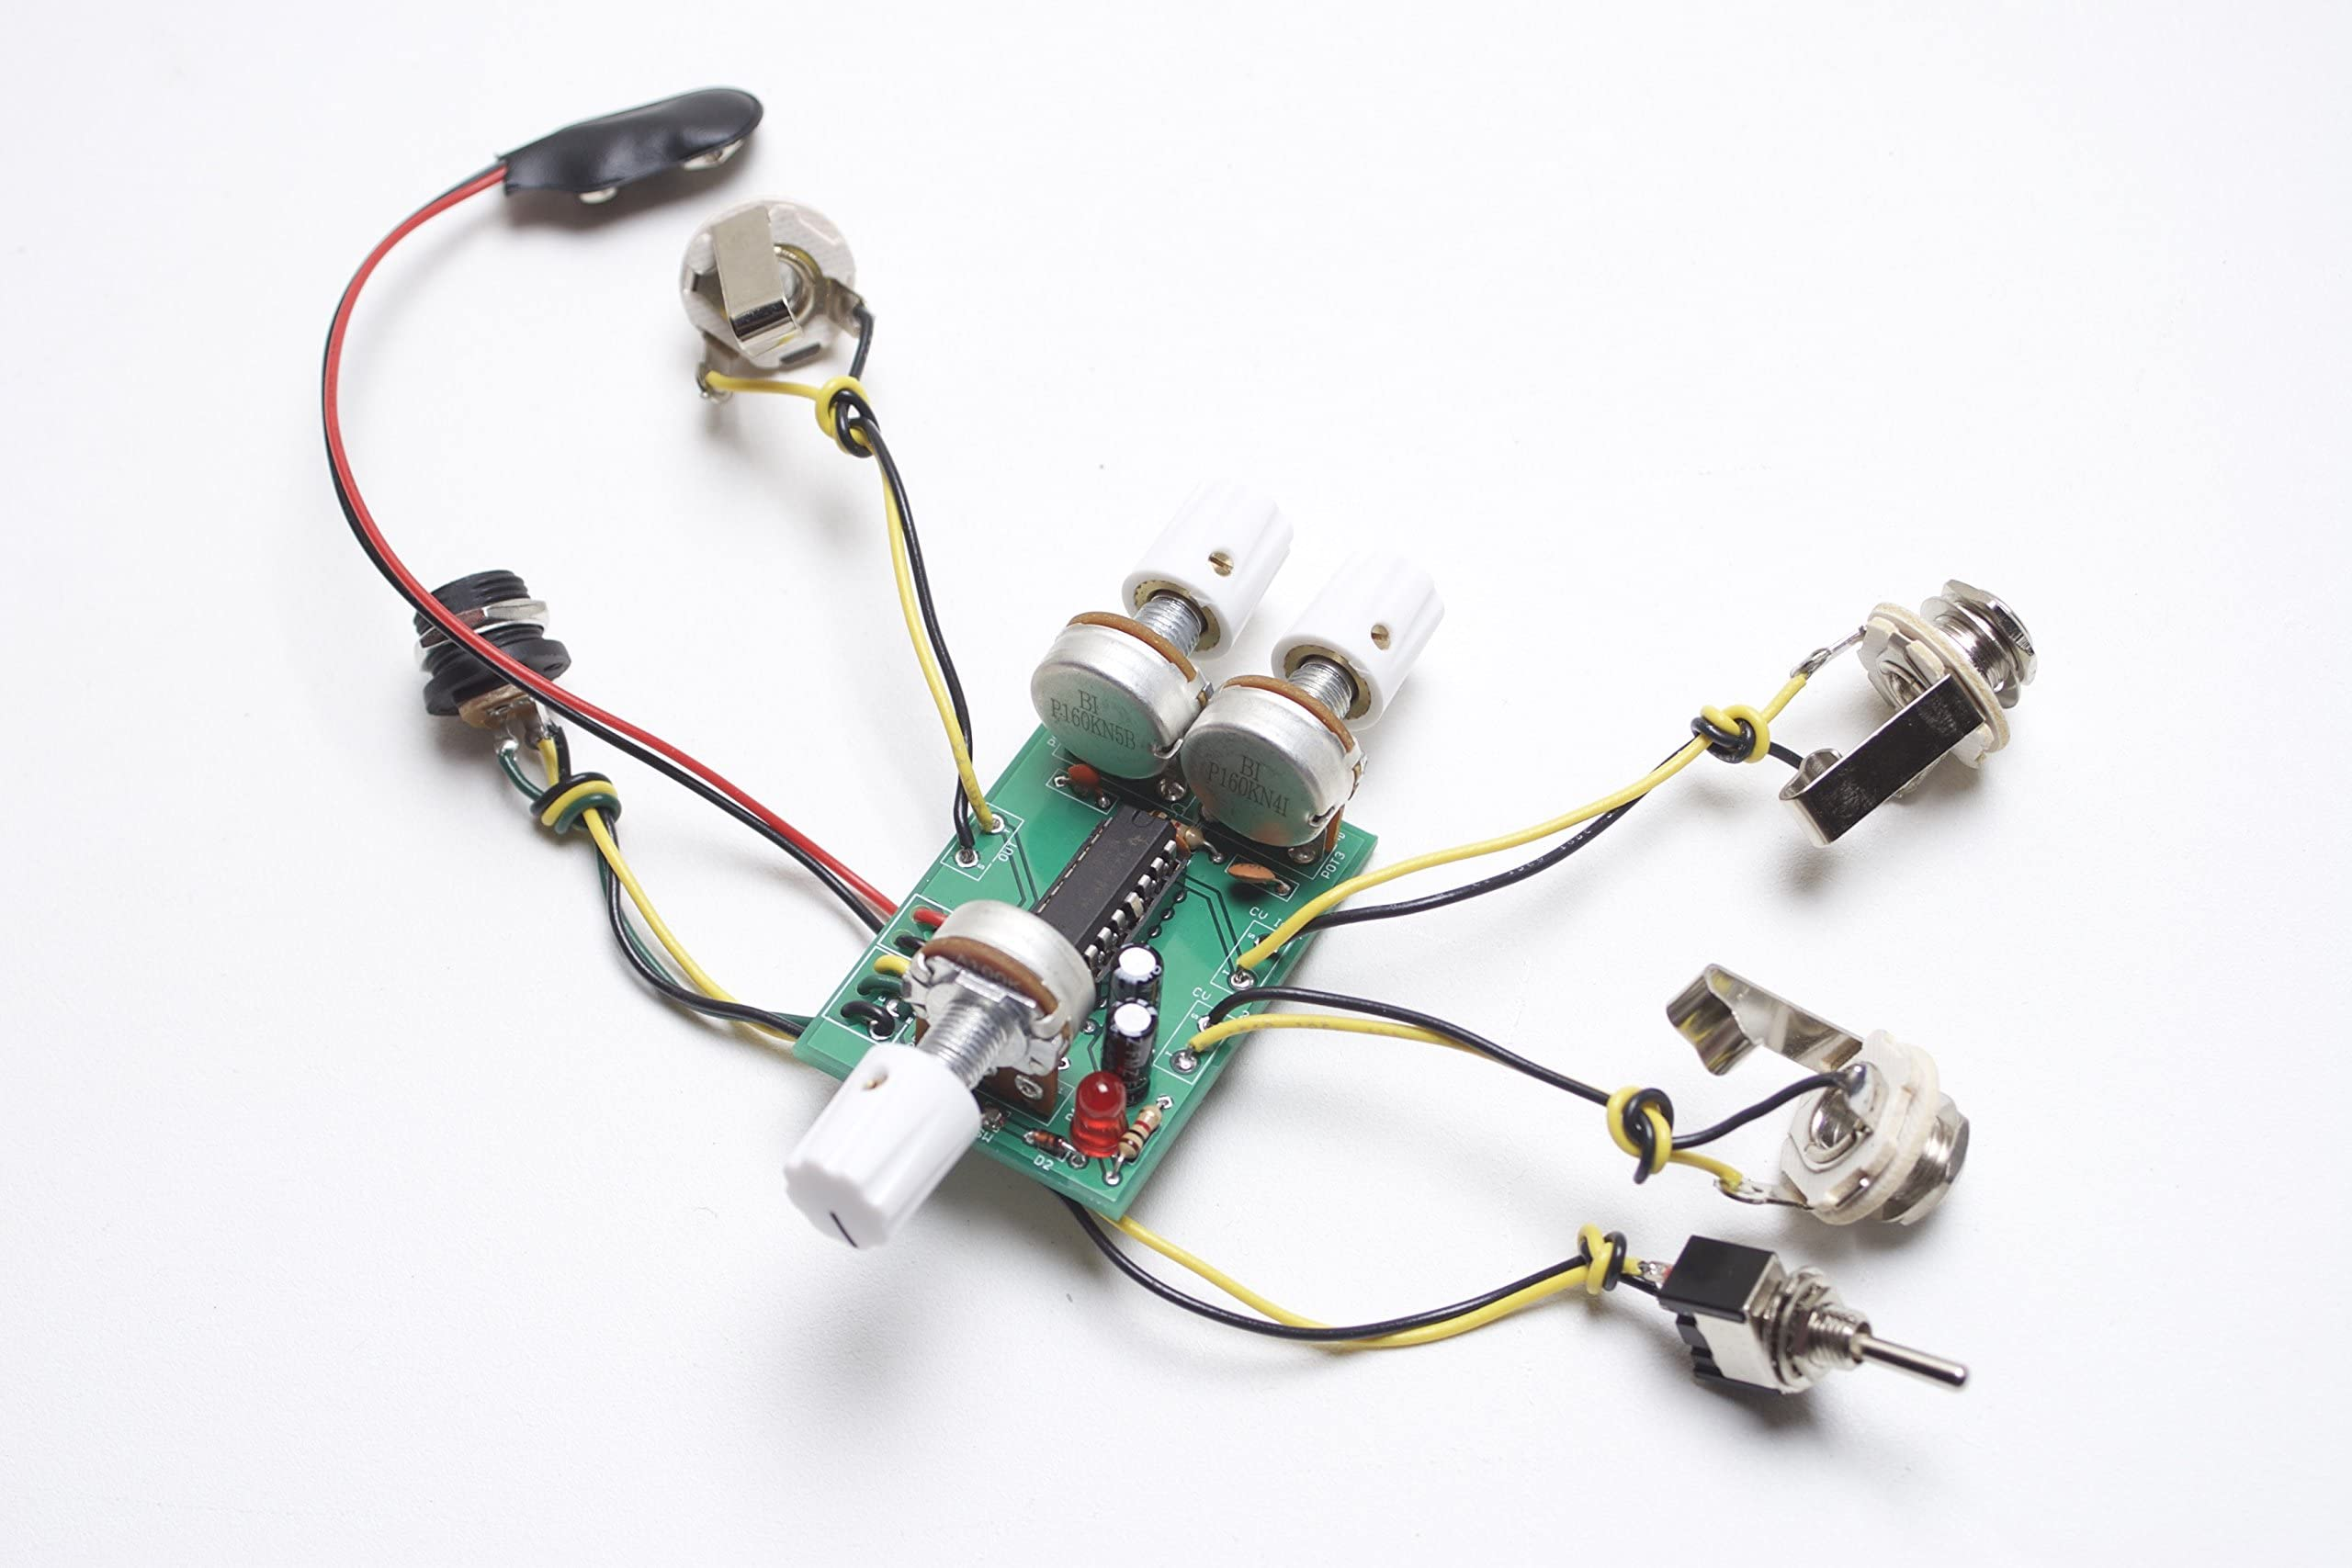 Synthrotek Atari Punk Console Kit Video Games This Was The Original Optical Theremin Circuit Image Unavailable